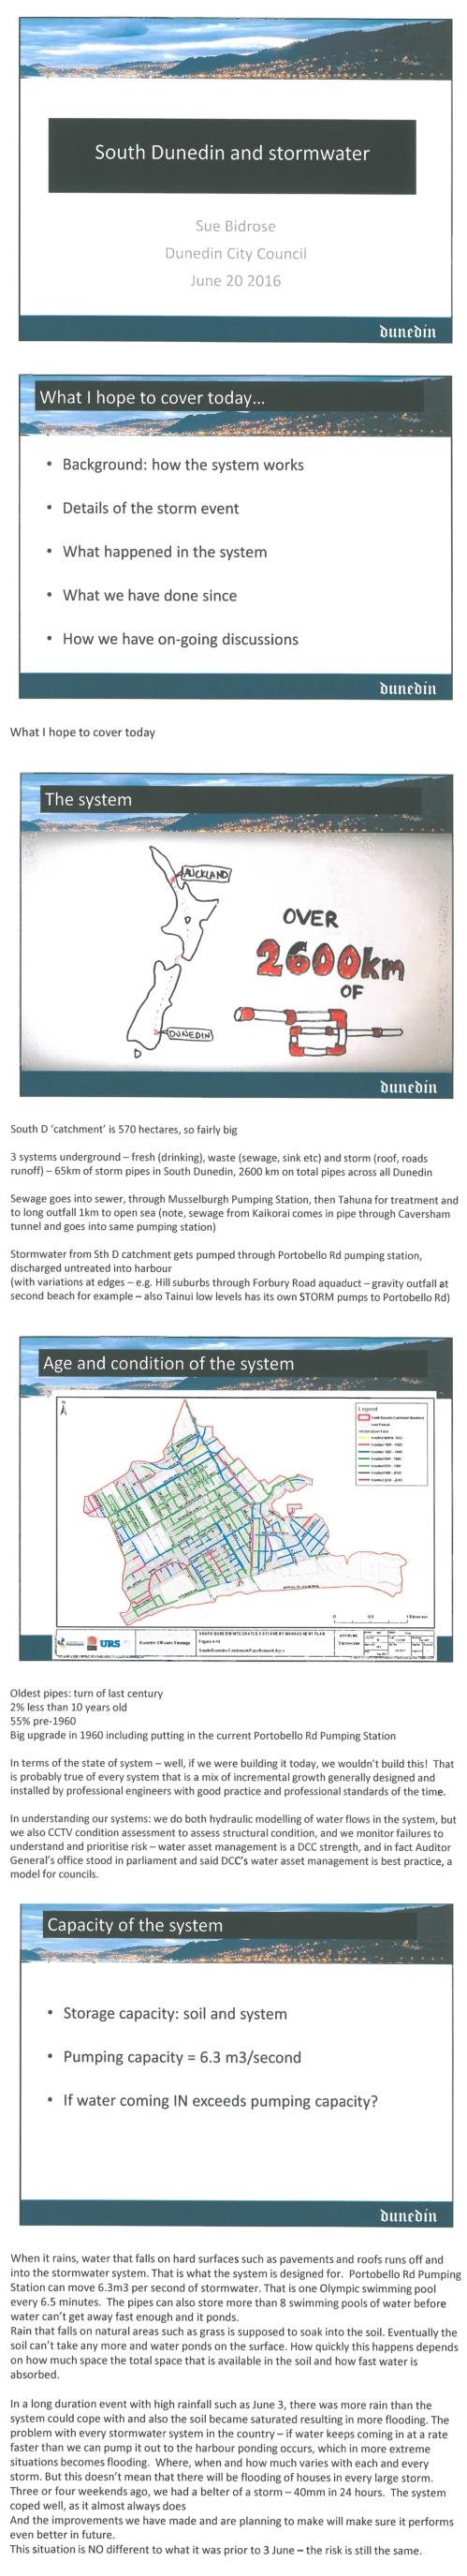 Sue Bidrose South Dunedin and stormwater June 20 2016 pp1-5